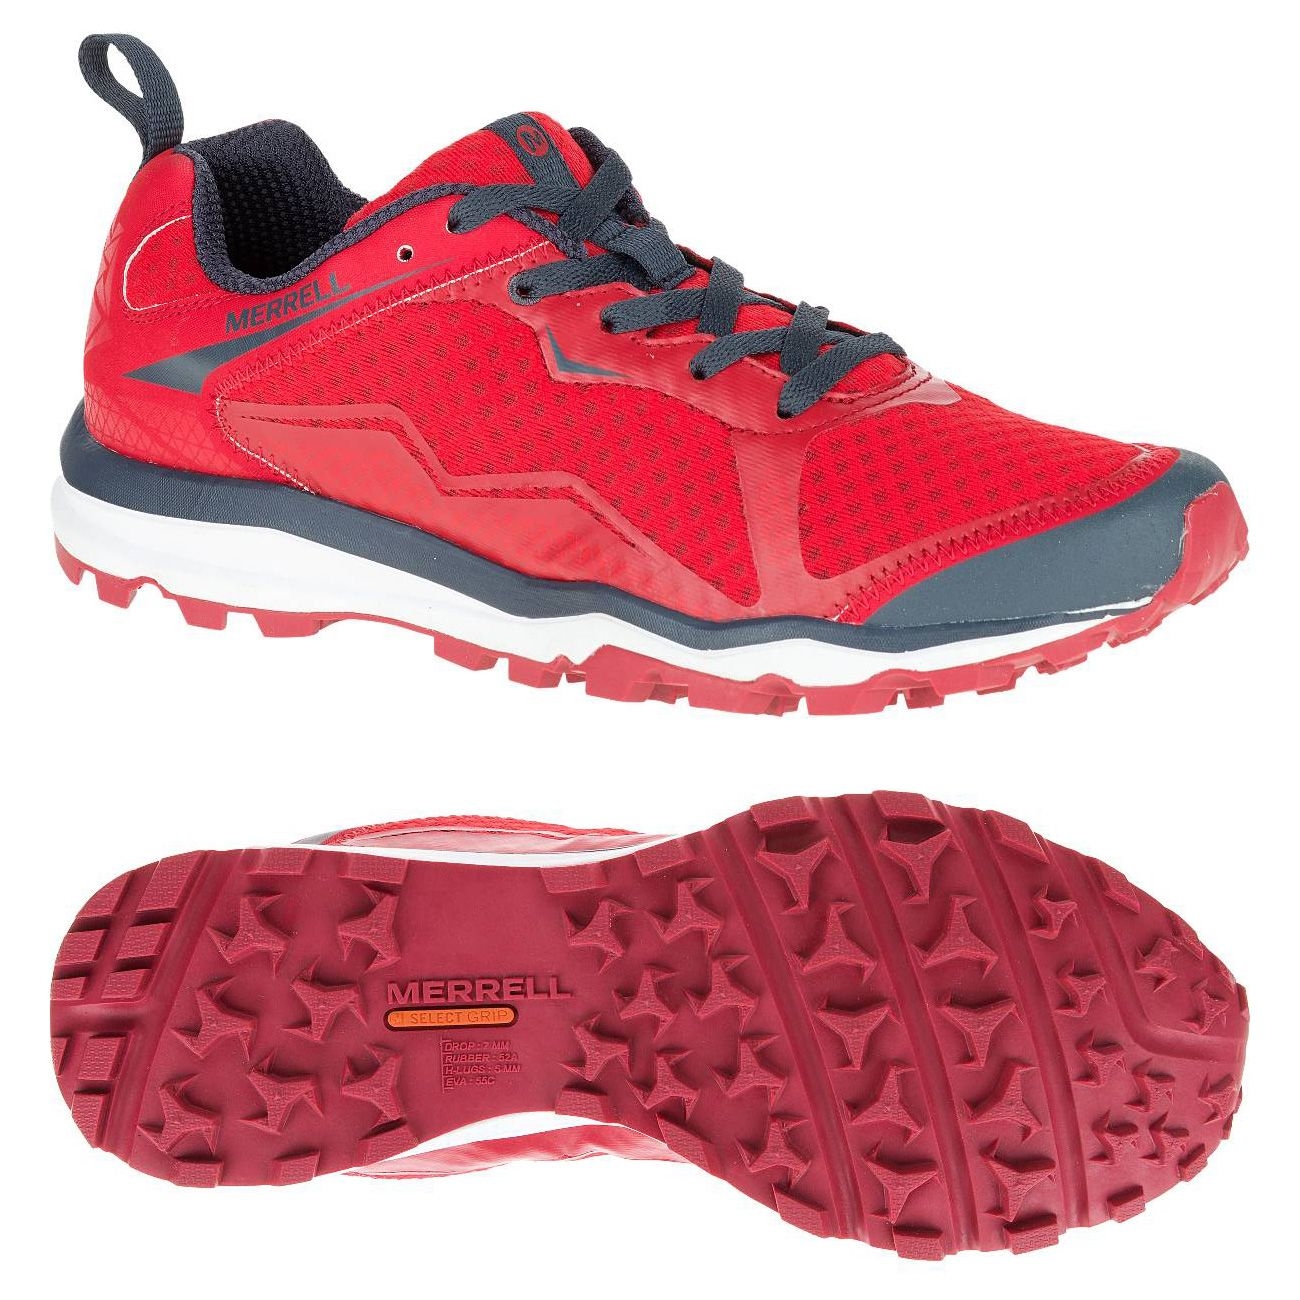 Merrell All Out Crush Light Trail Running Shoe